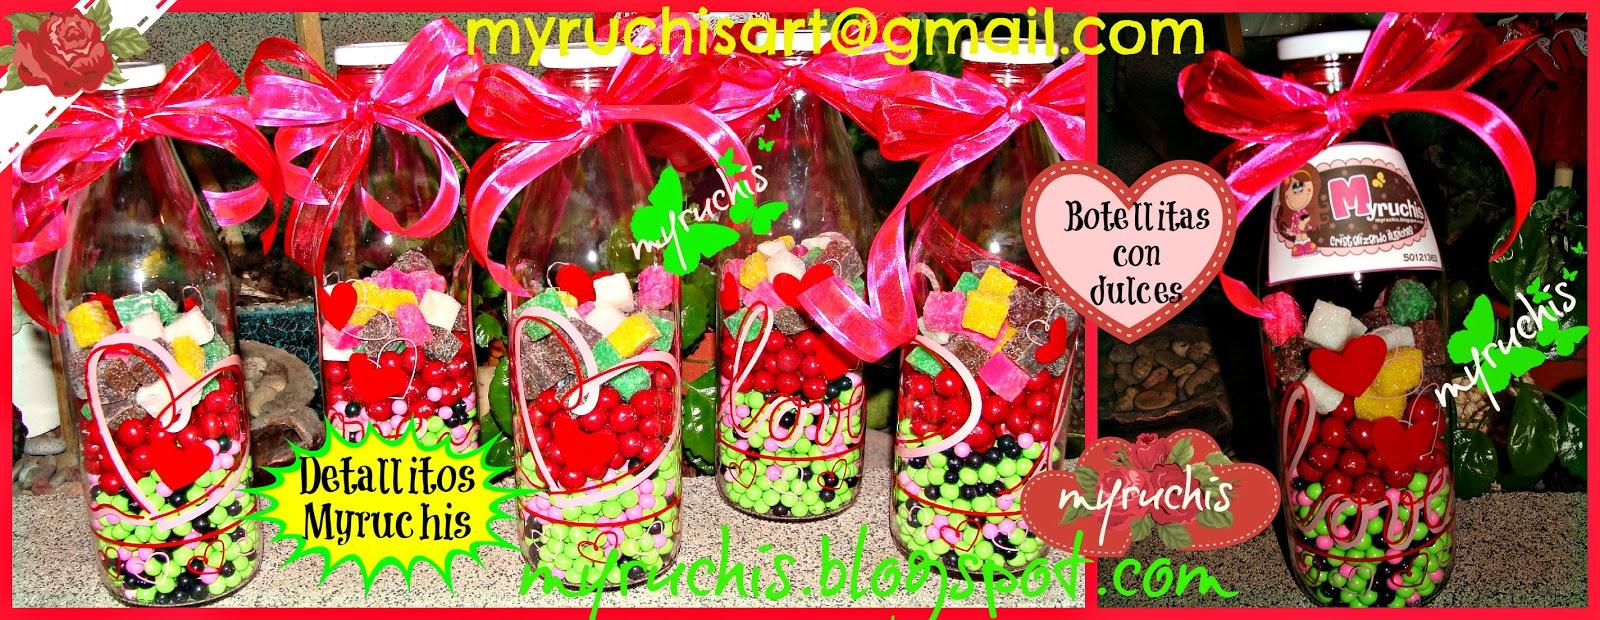 Myruchis: Detalles. Botellitas de vidrio con dulces.